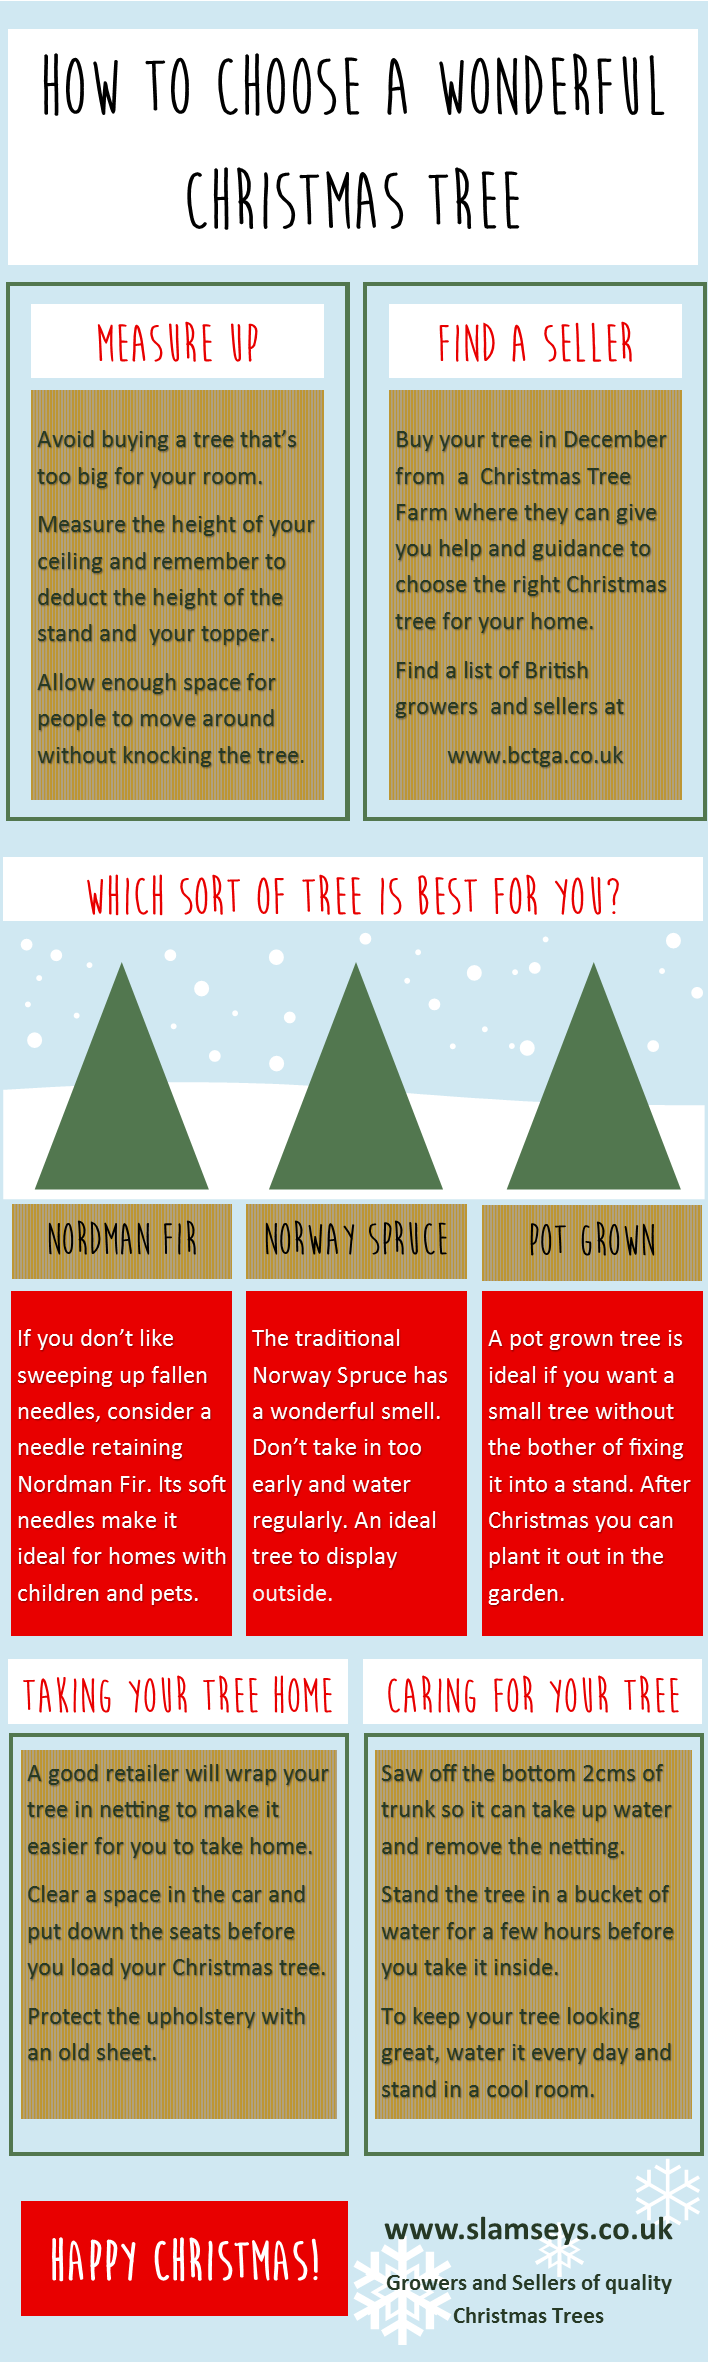 how to choose a wonderful Christmas tree